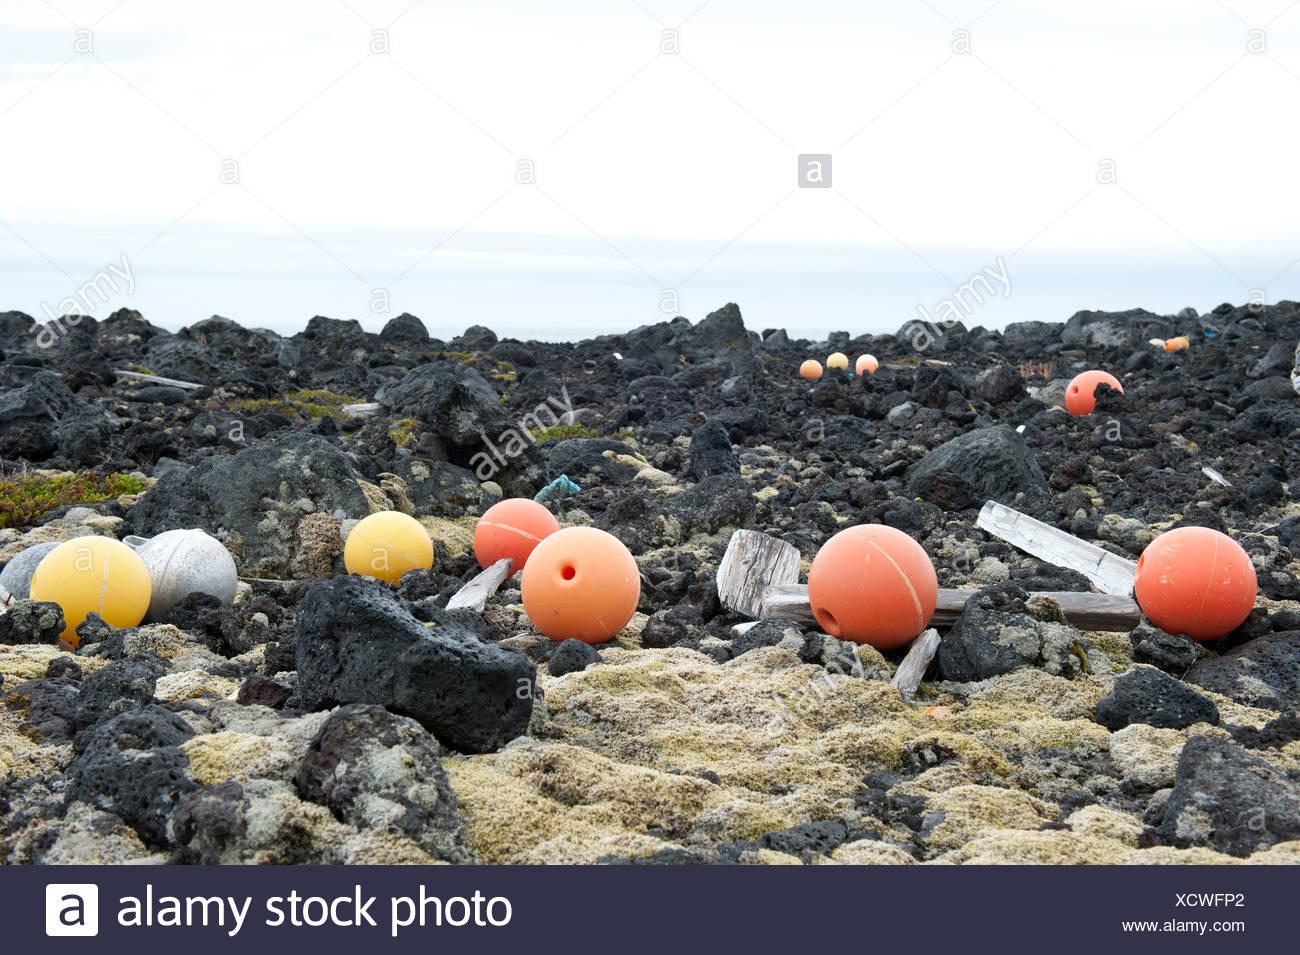 Buoys, swimmers, floating debris, stranded goods, near Dritvík, Snæfellsnes peninsula, Ísland, Iceland, Scandinavia - Stock Image